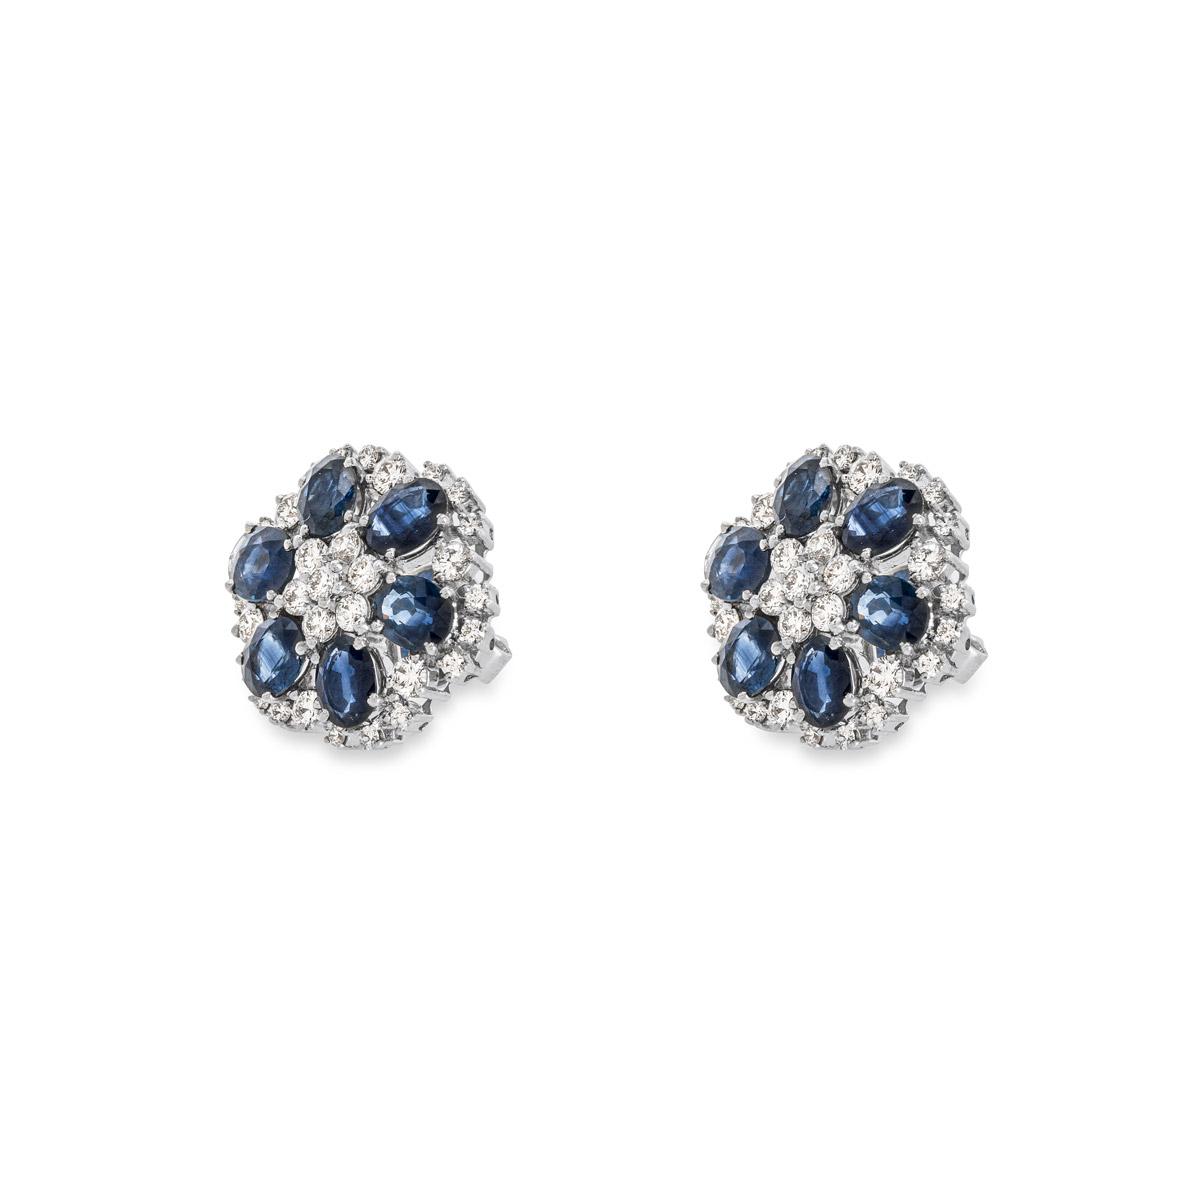 White Gold Diamond and SapphireEarrings